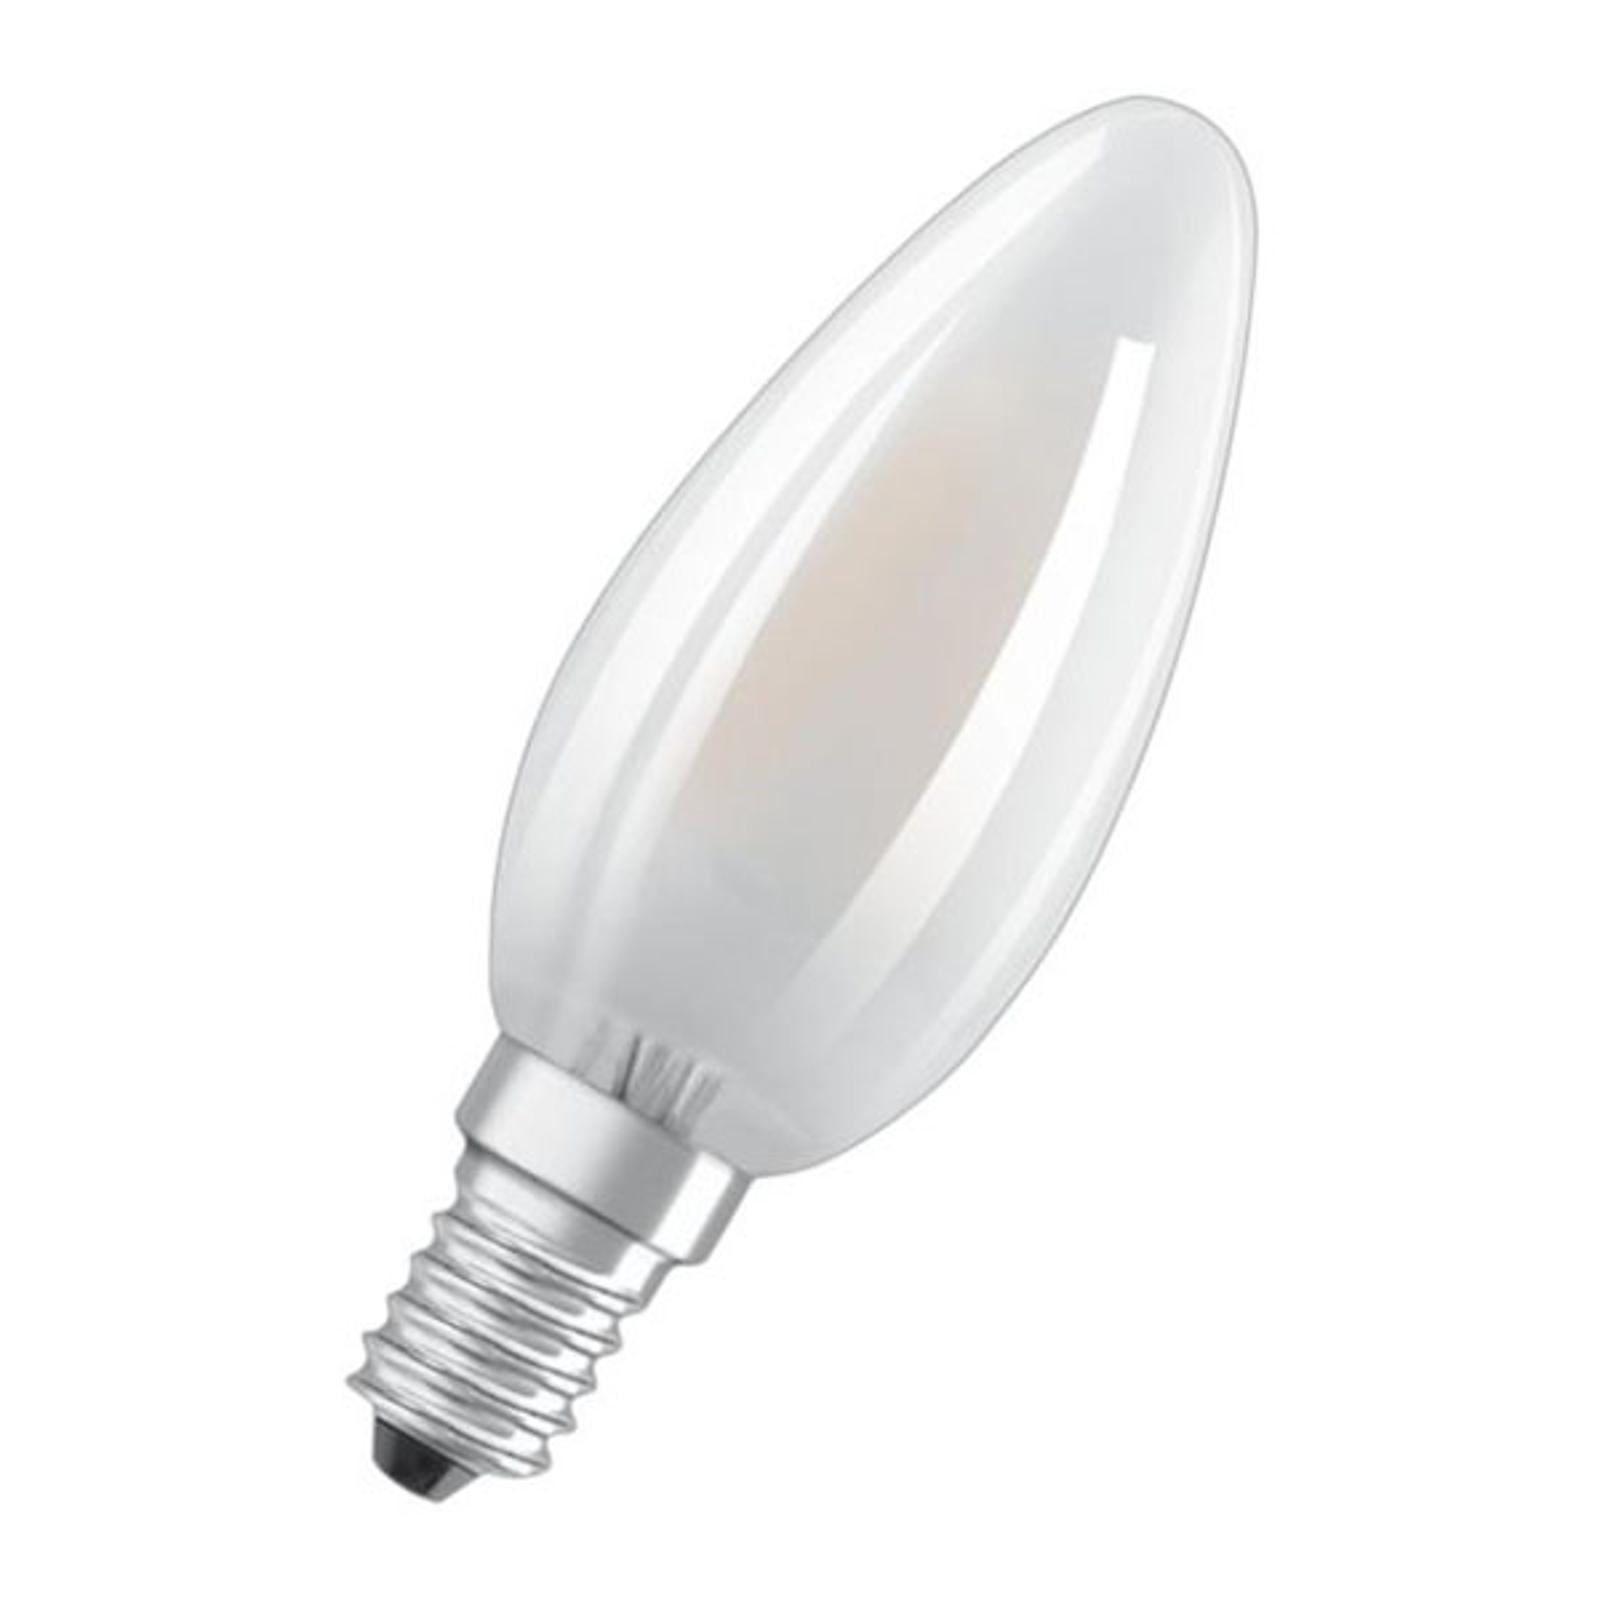 OSRAM Classic B LED-lampa E14 1,5 W 2700K matt